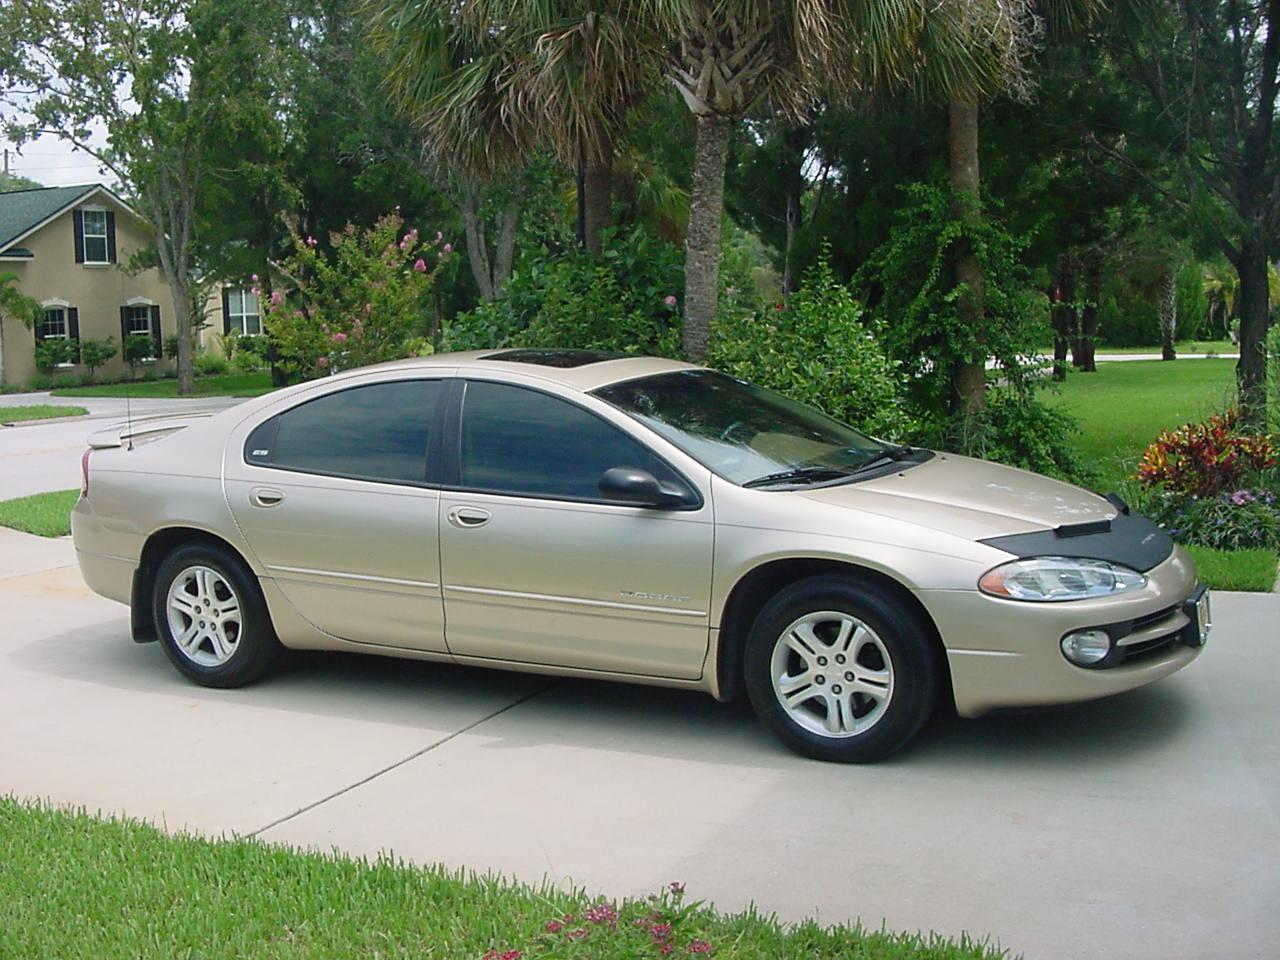 Dodge Intrepid 2000 foto - 1